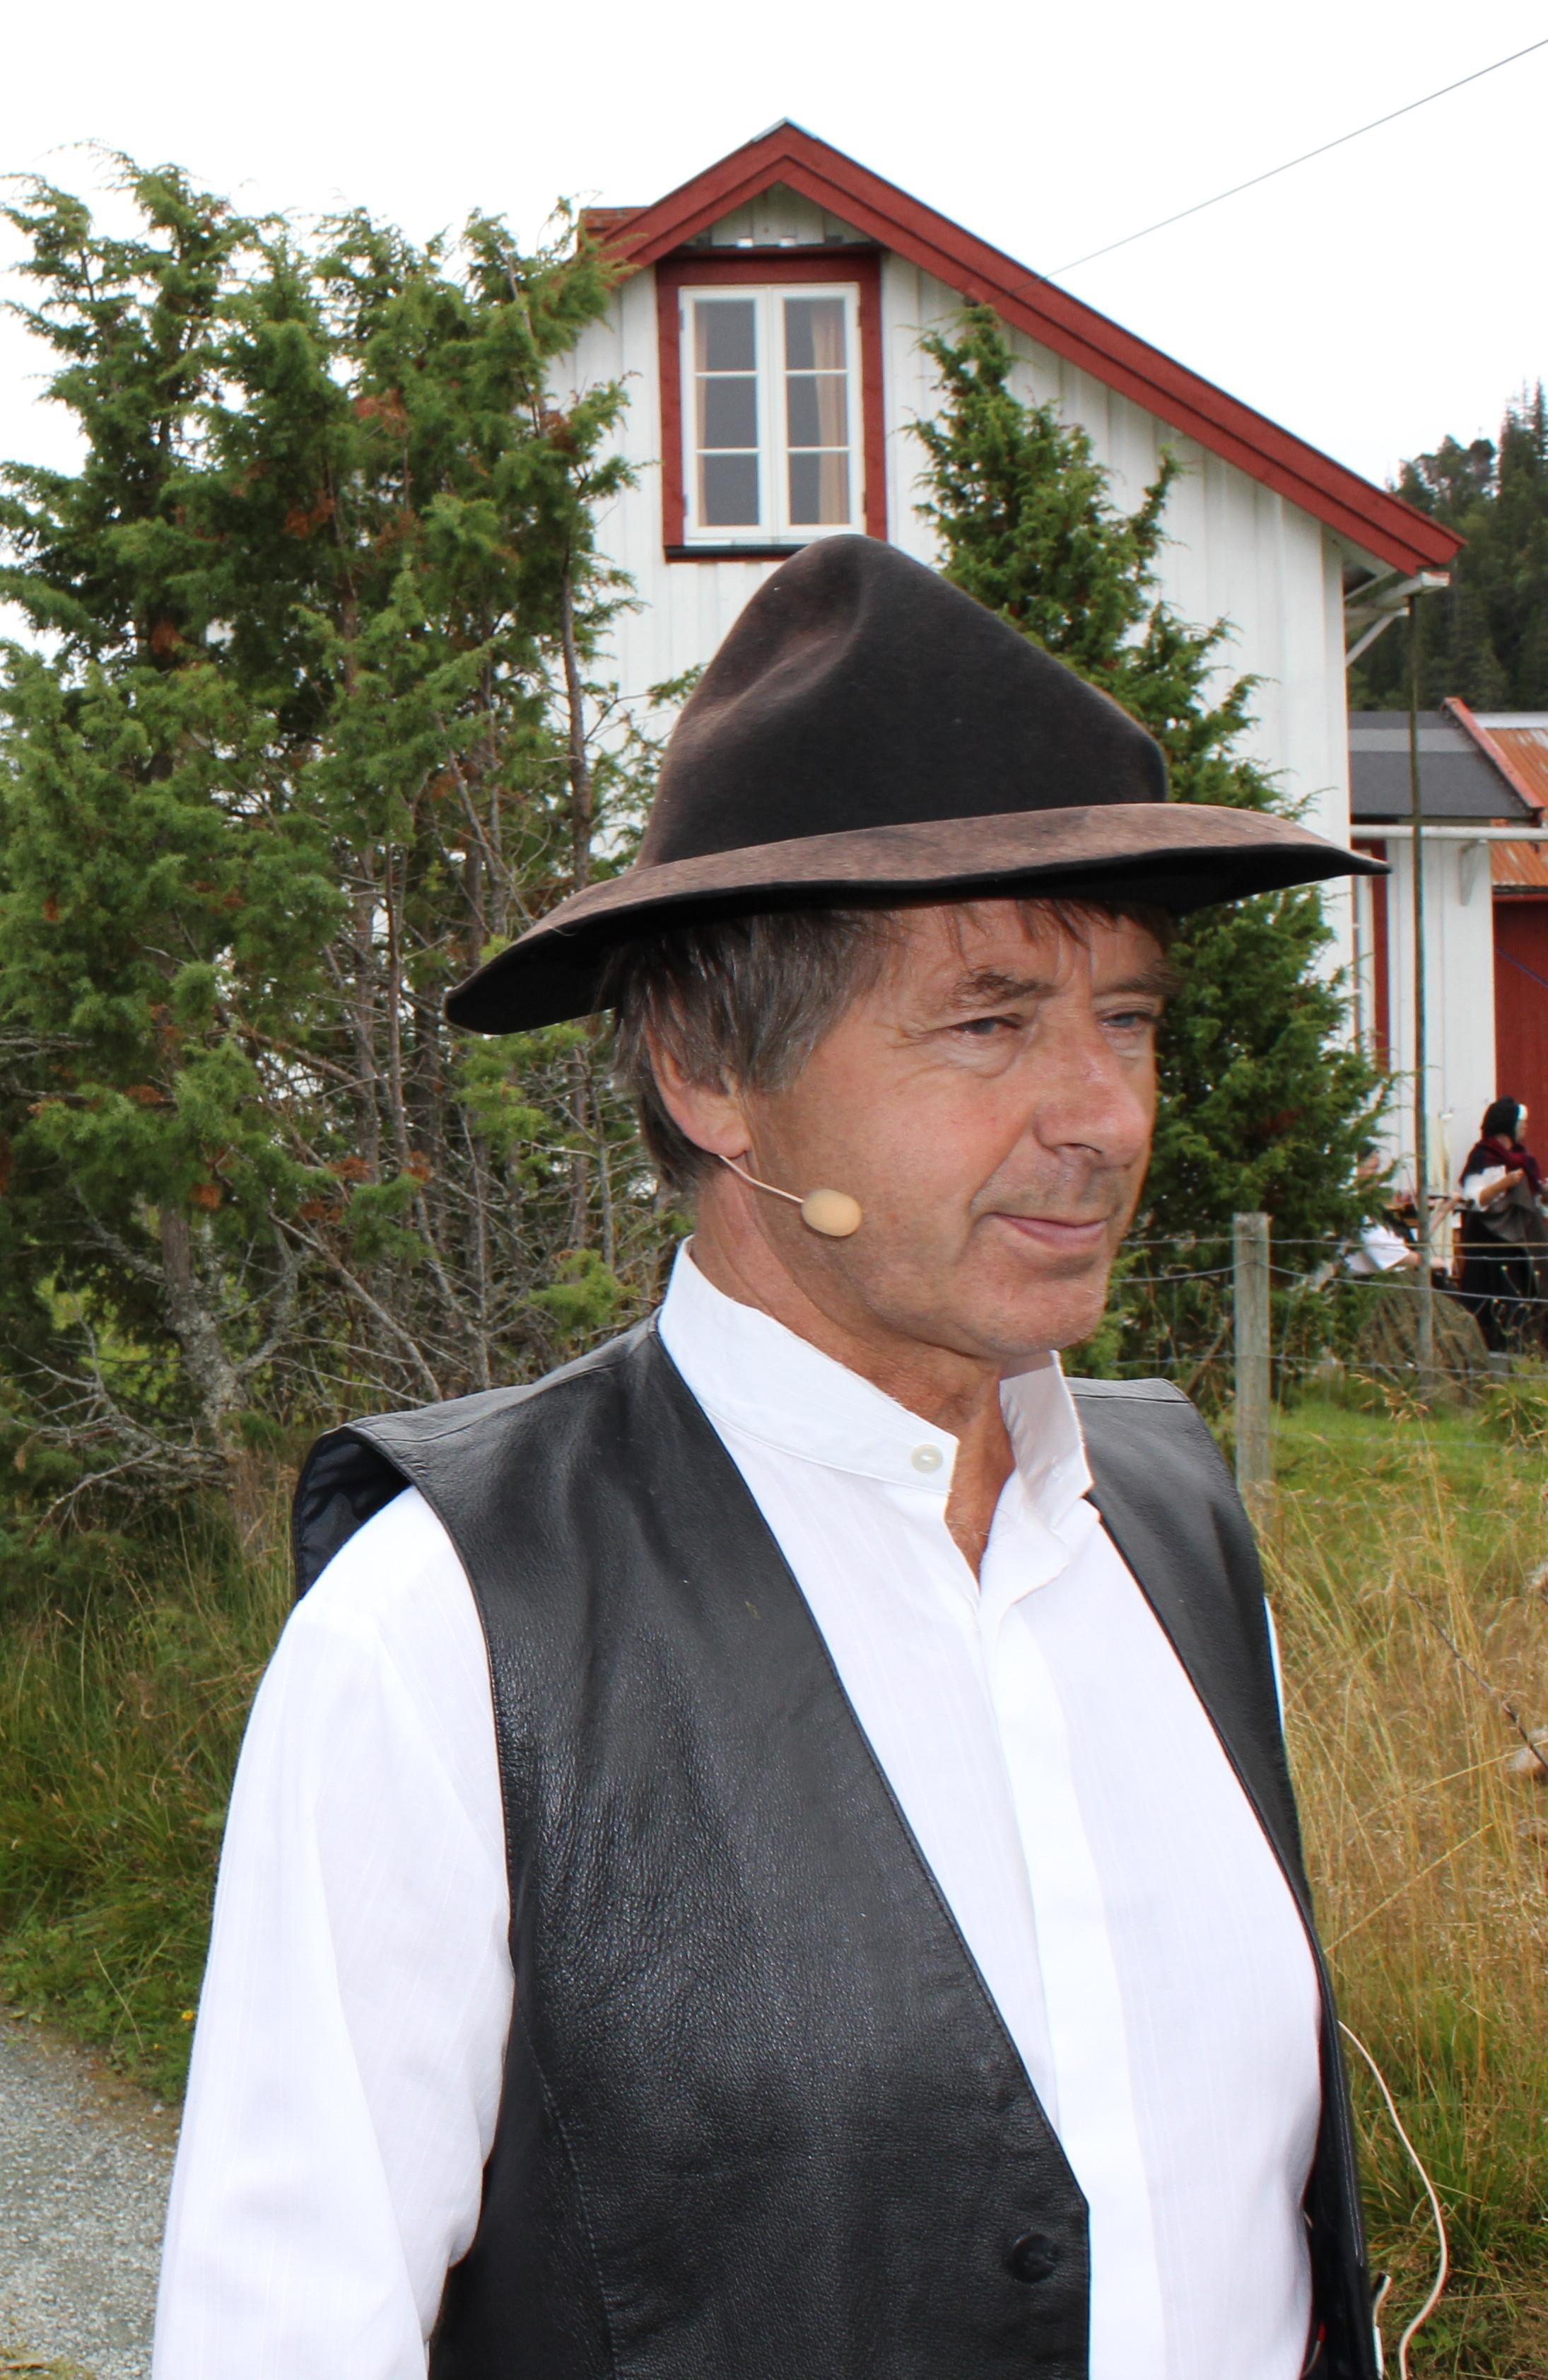 «En høstdag i Onsøyhåggån» 1. september 2012